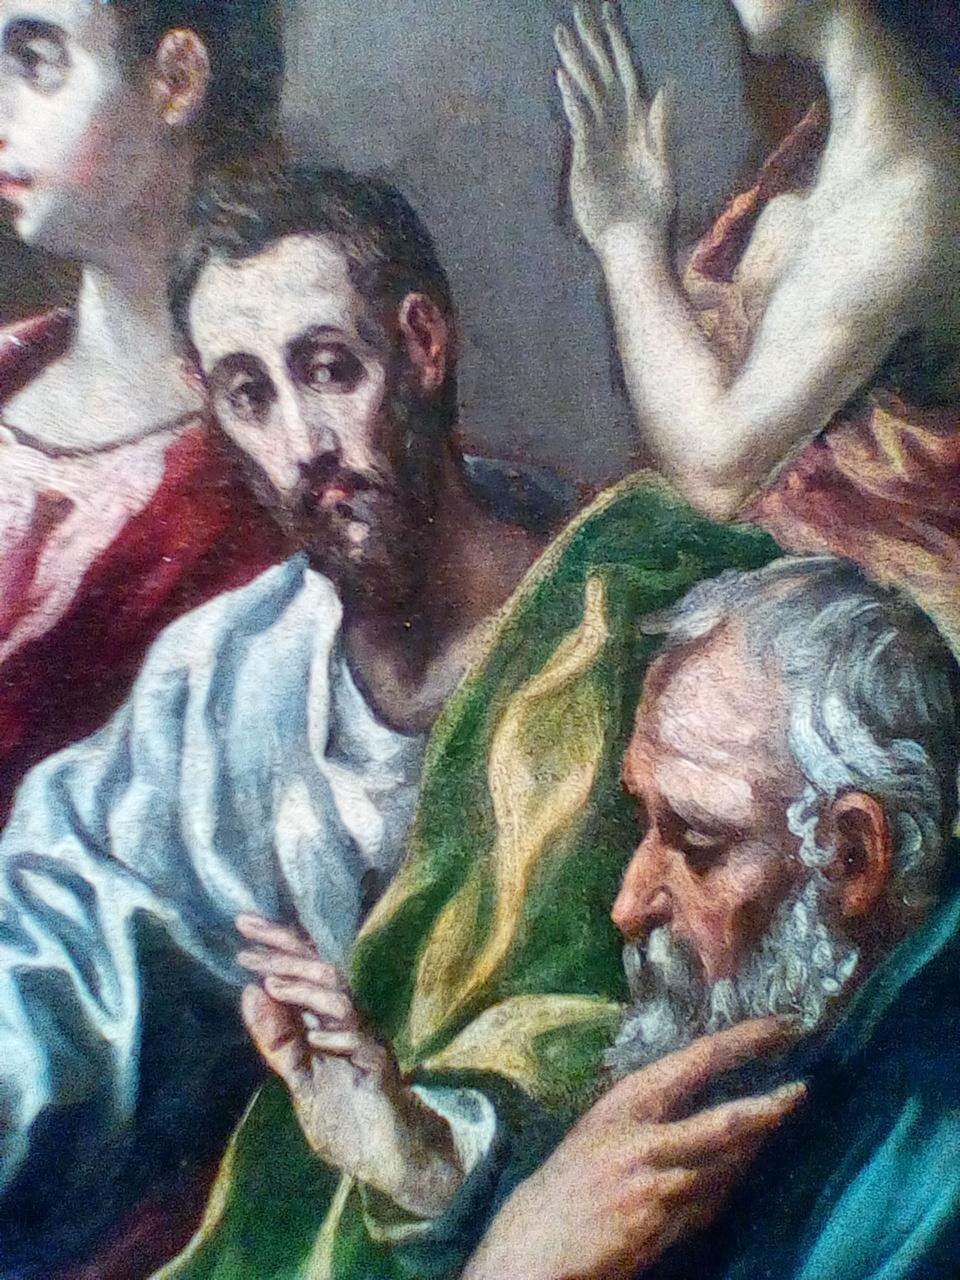 Eργο Γρεκο παραδοξα ομορφο αφου εγινε απο μαθητες του και οχι απο αυτον